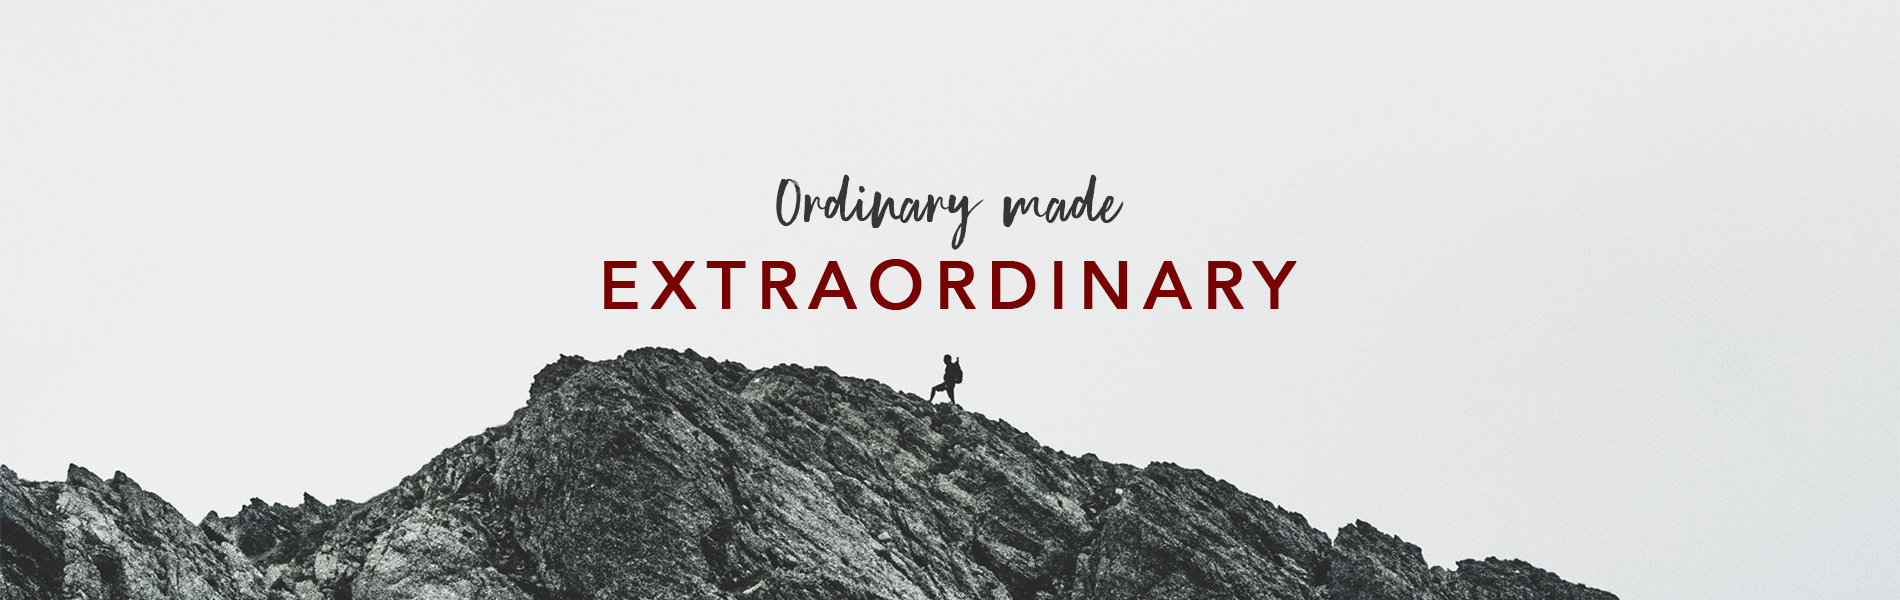 2019_07_July_Ordinary_Extraordinary_EN New Creation TV | Broadcasting the Gospel of Jesus